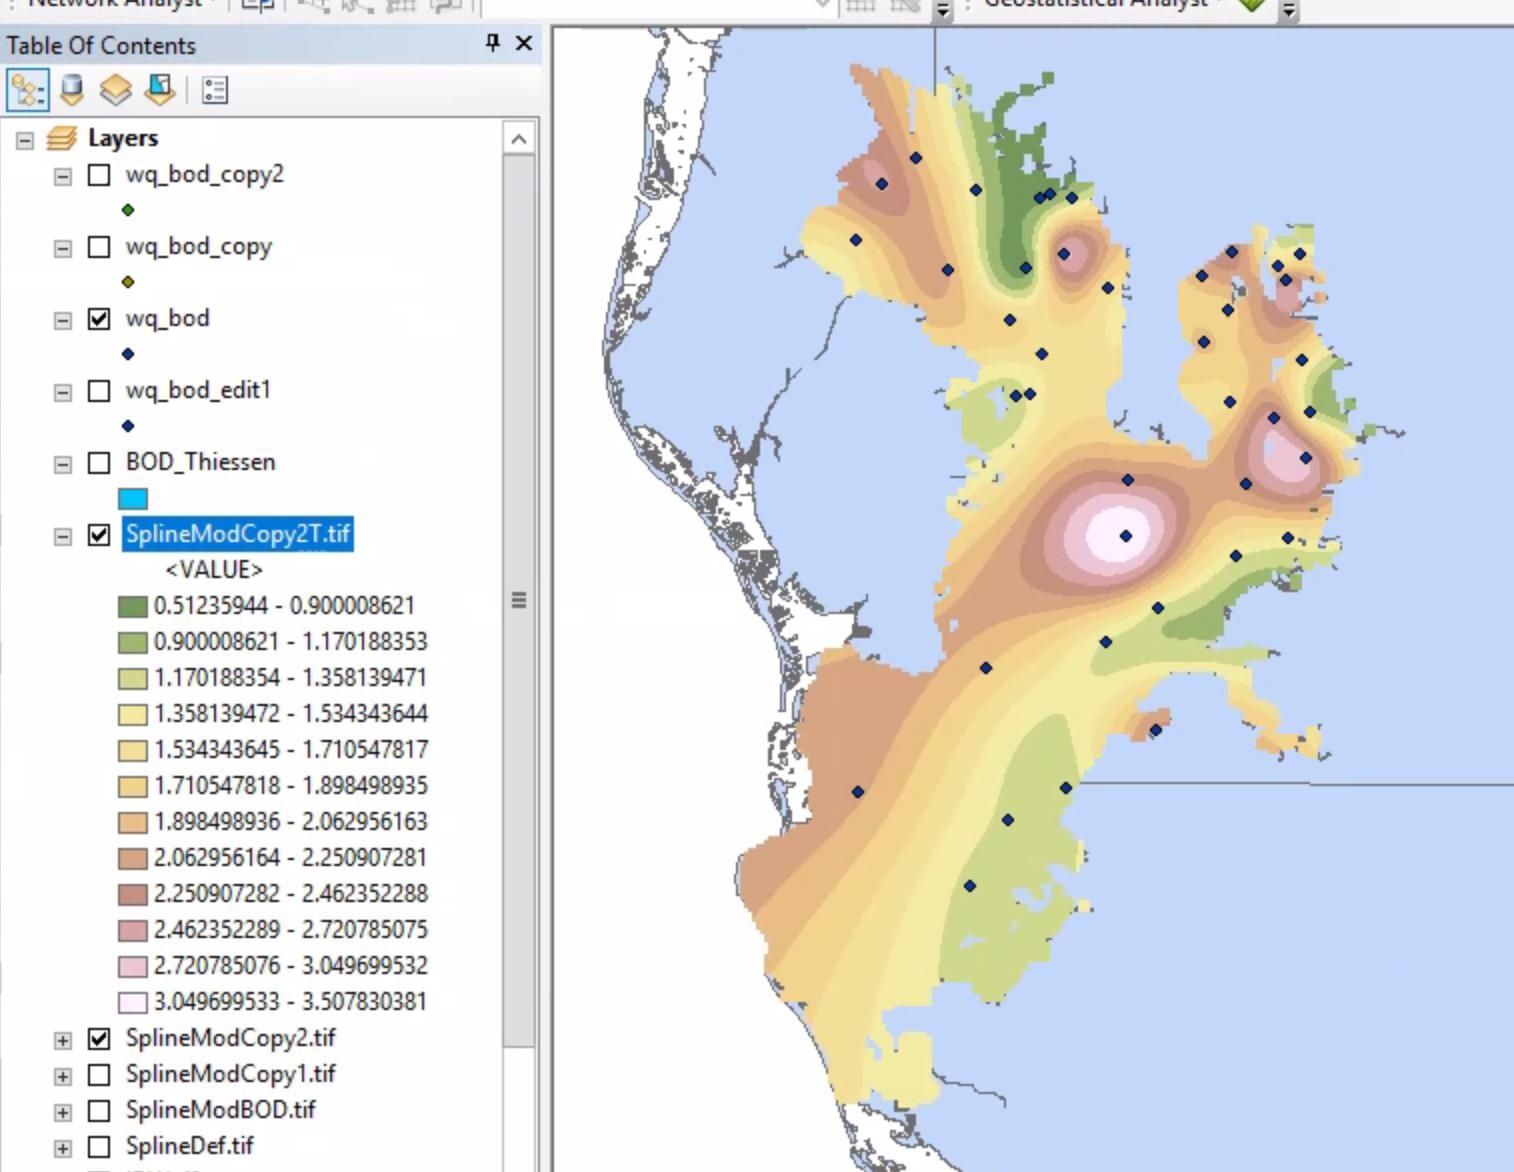 Melissa Thrush's UWF GIS Online Blog: GIS5935 - Lab 8 - Surface